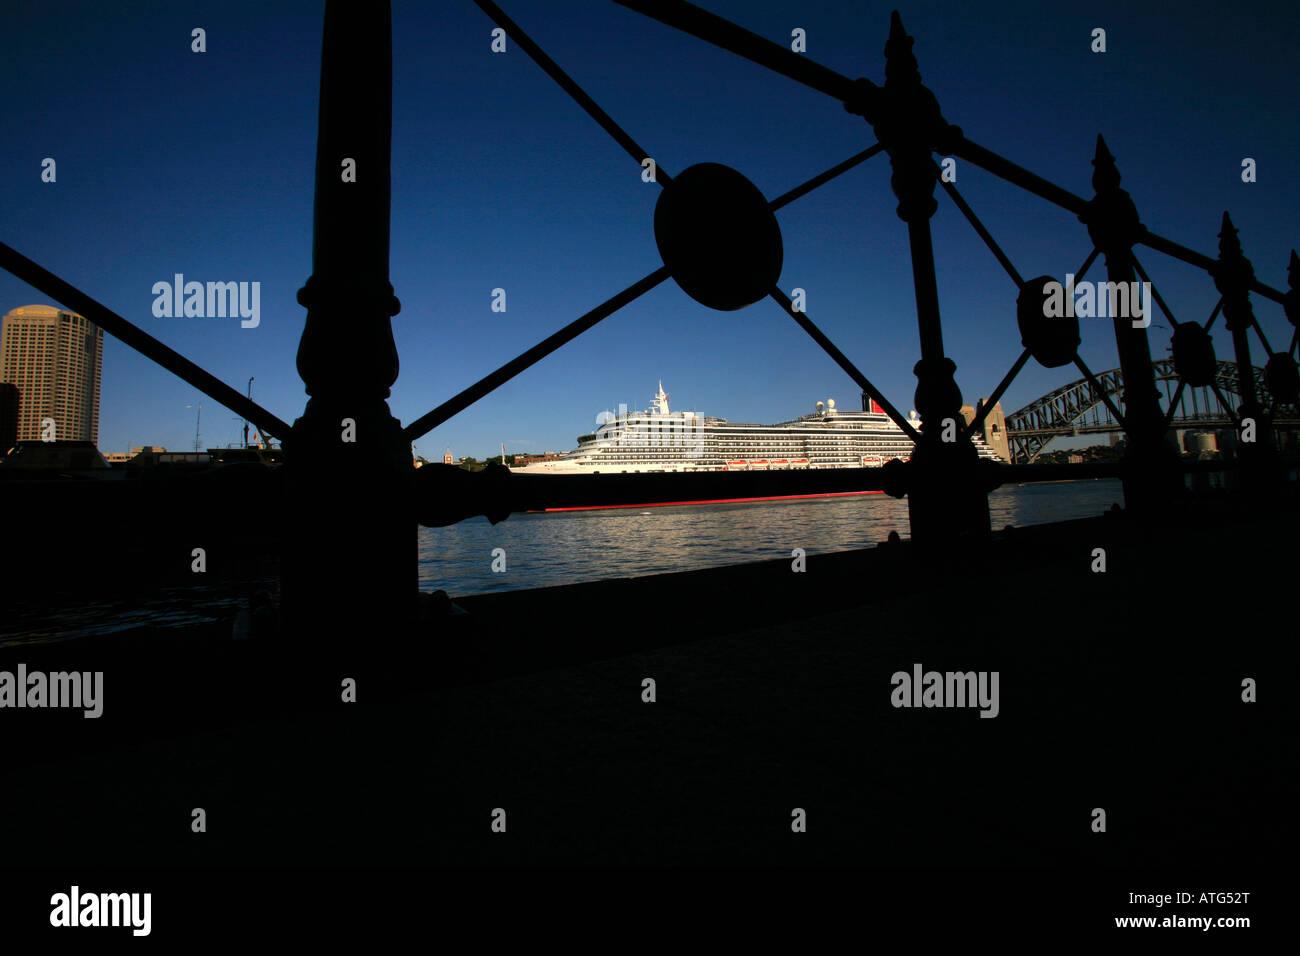 Cruise Liner Circular Quay Sydney Australia - Stock Image